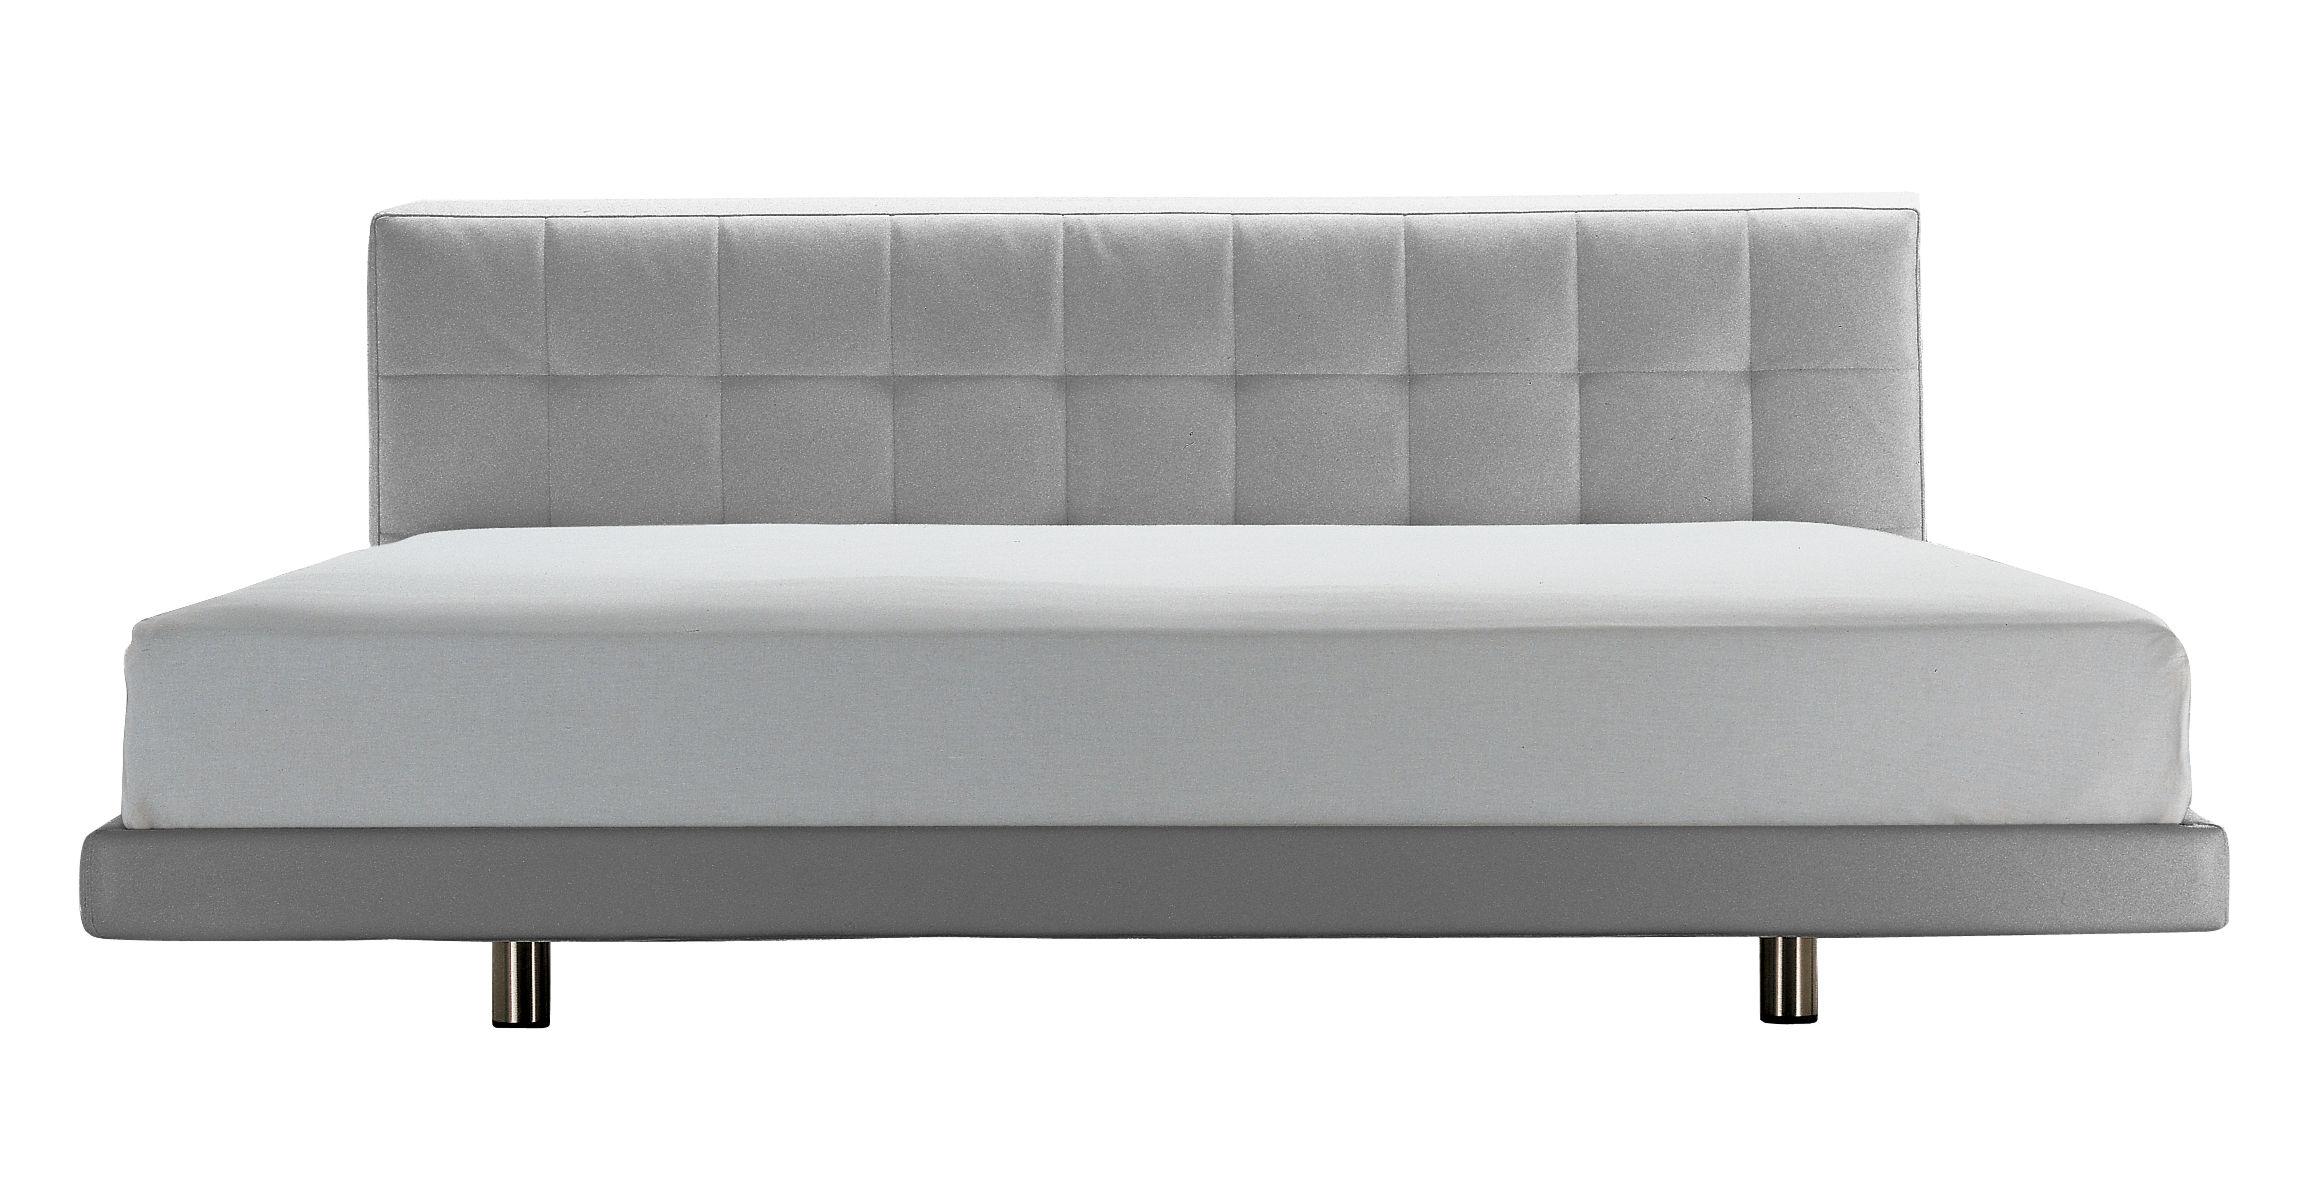 Mobilier - Lits - Lit double Alfa / 166 x 228 cm - Zanotta - Tissu - Gris - Acier, Tissu